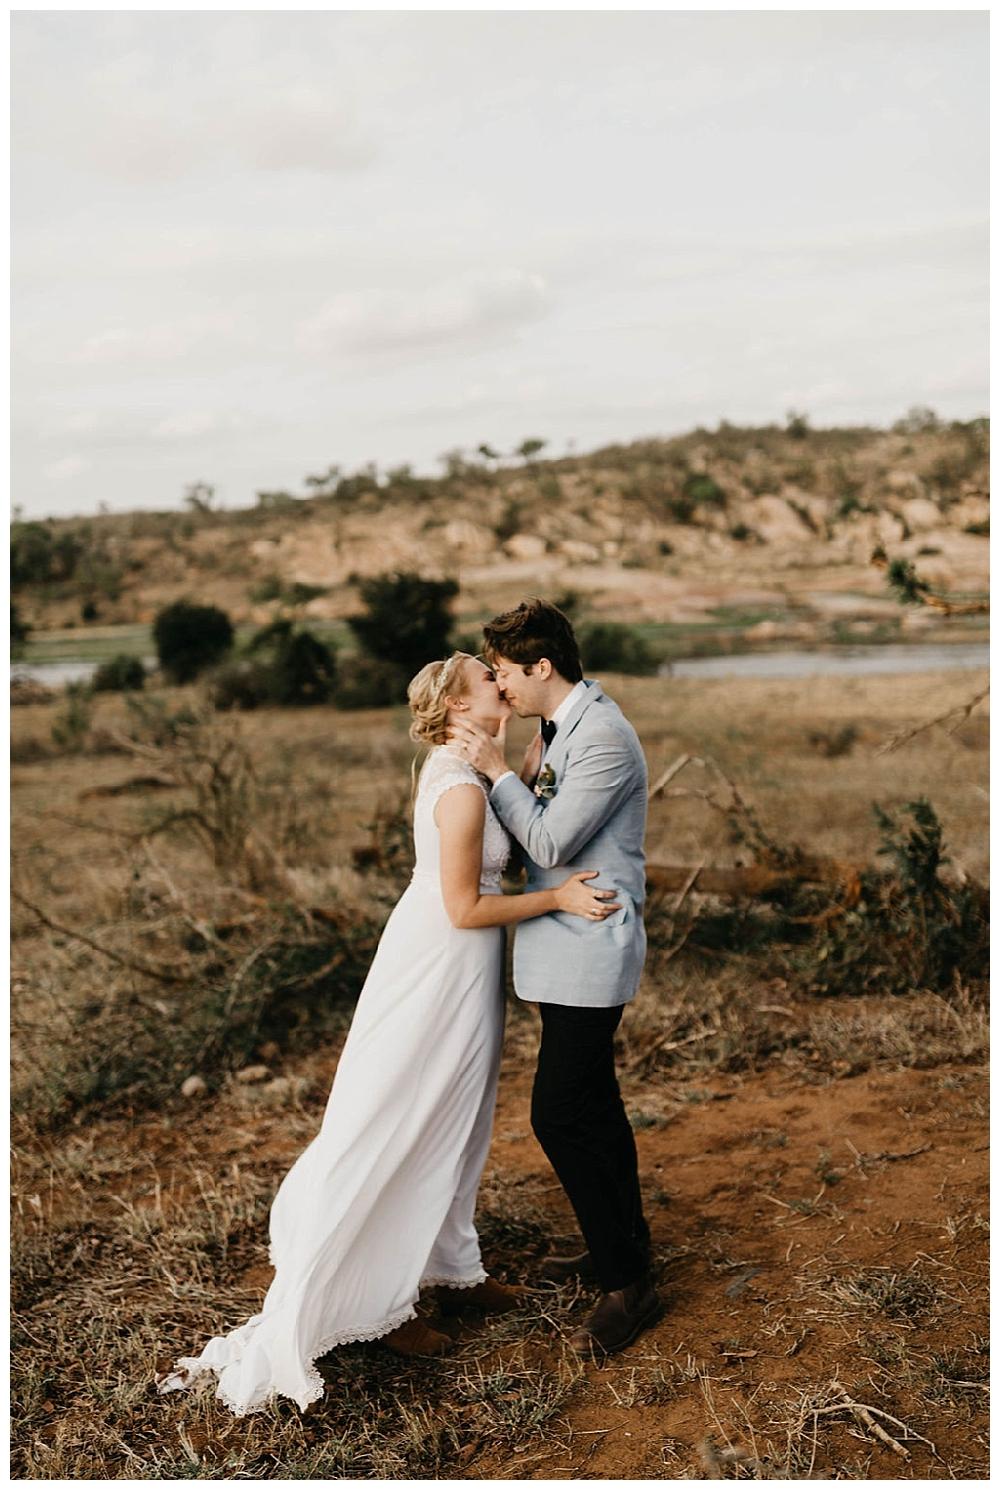 christinakarstphotography_southafricaelopement-364.jpg